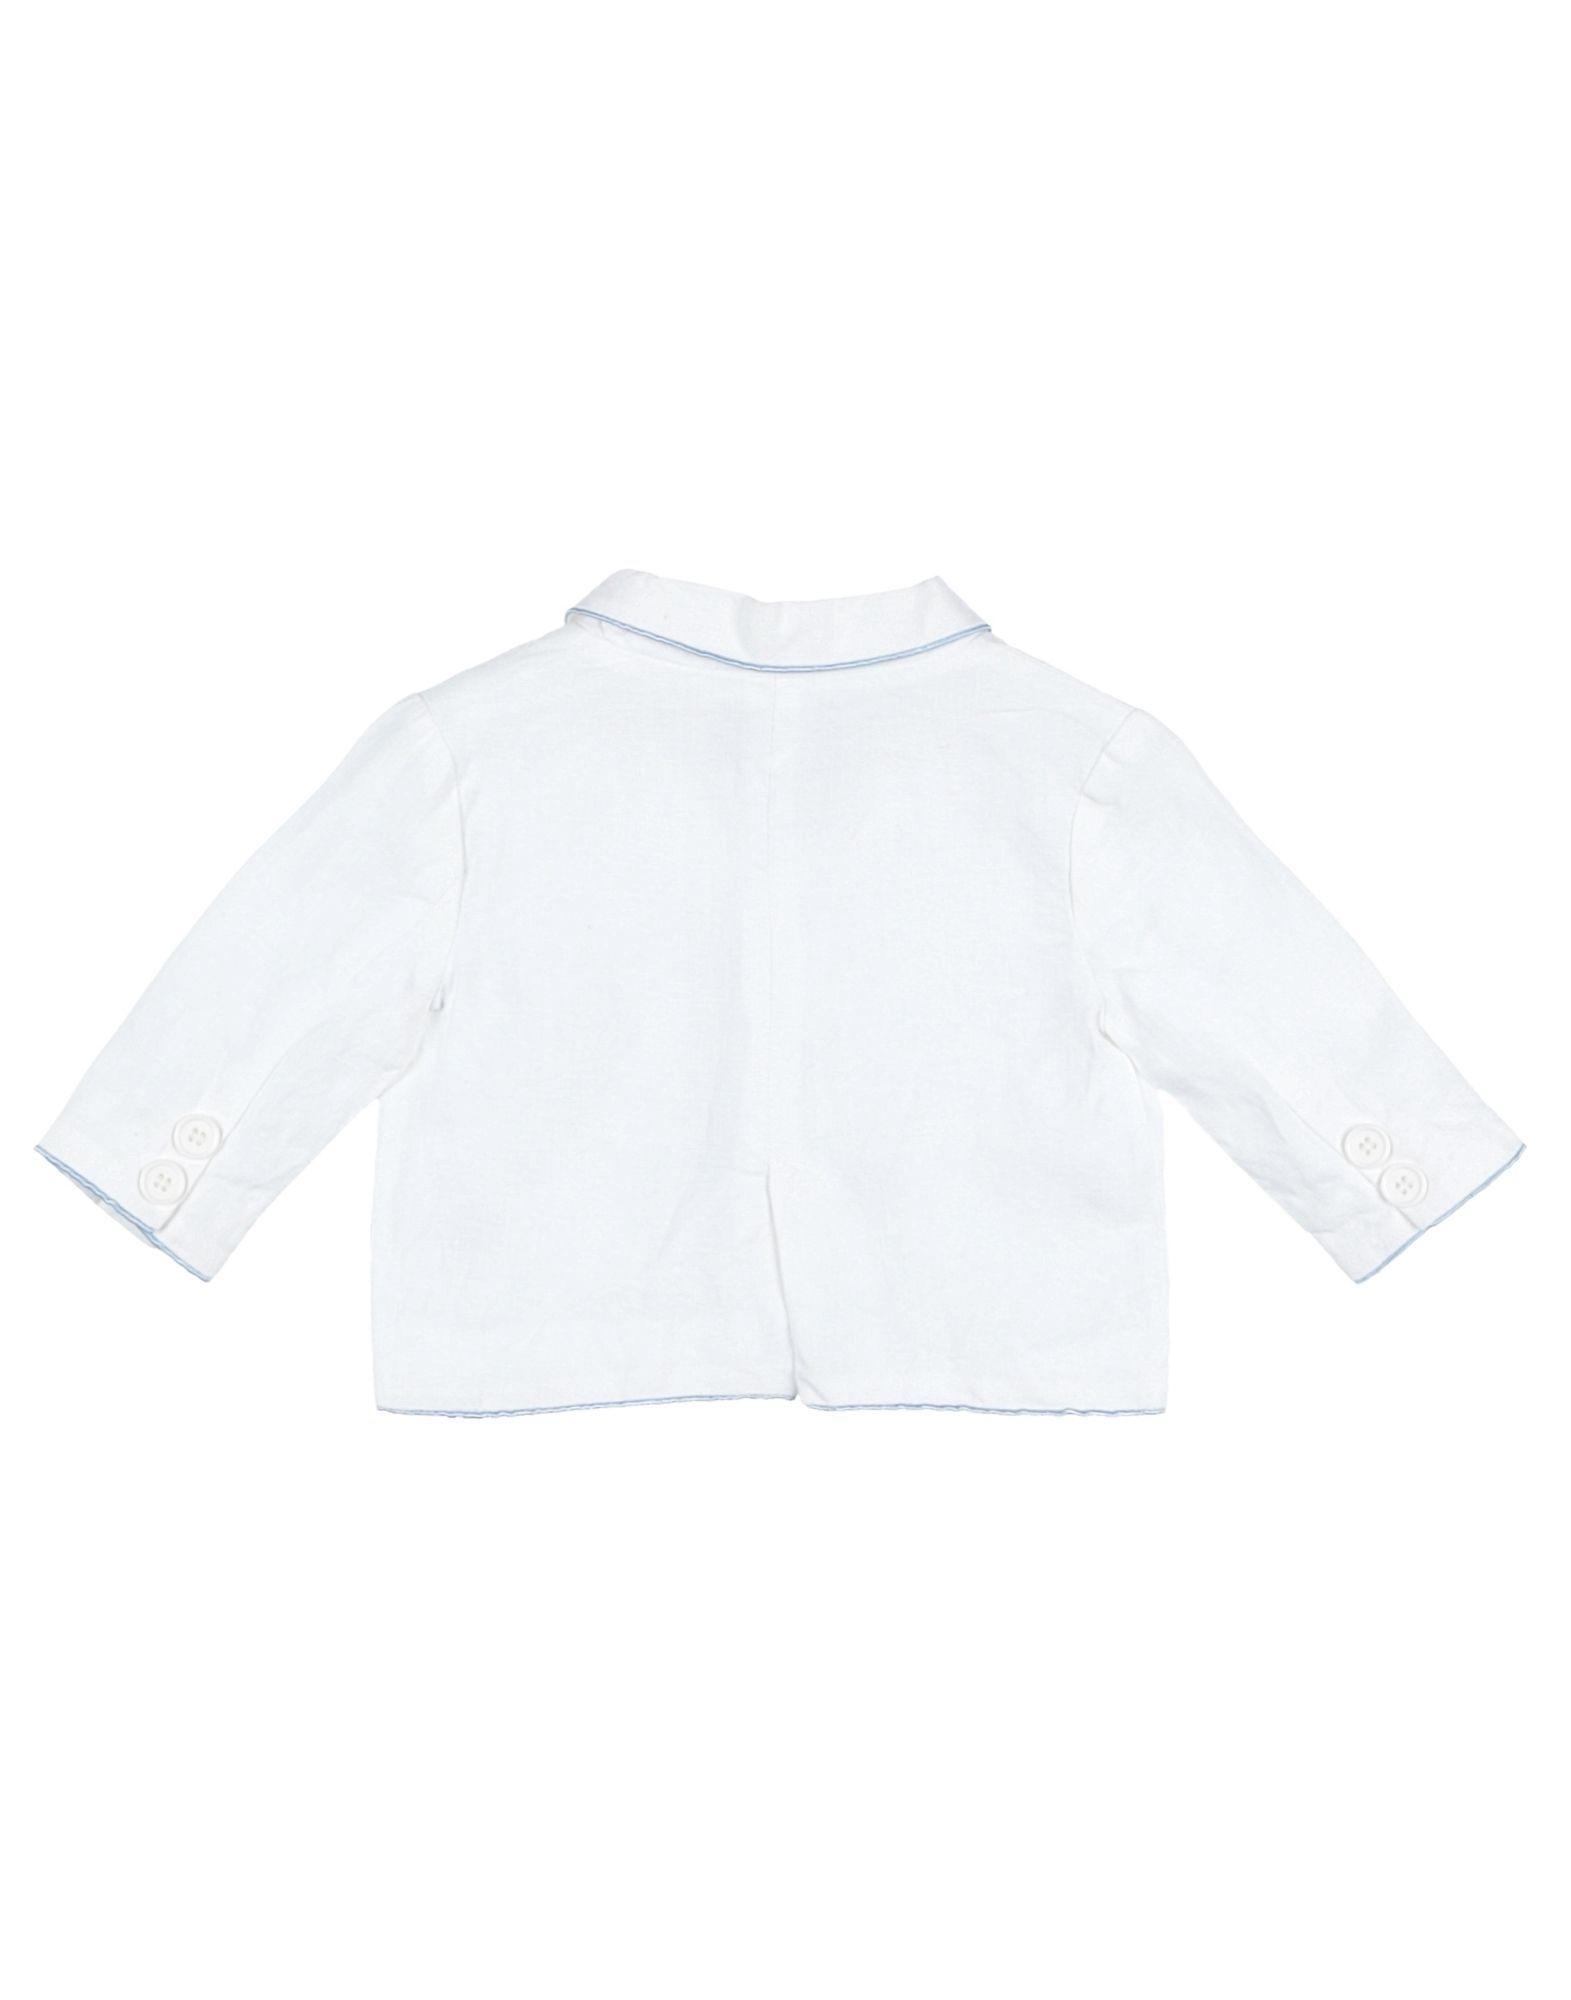 SUITS AND JACKETS Simonetta Tiny White Boy Linen